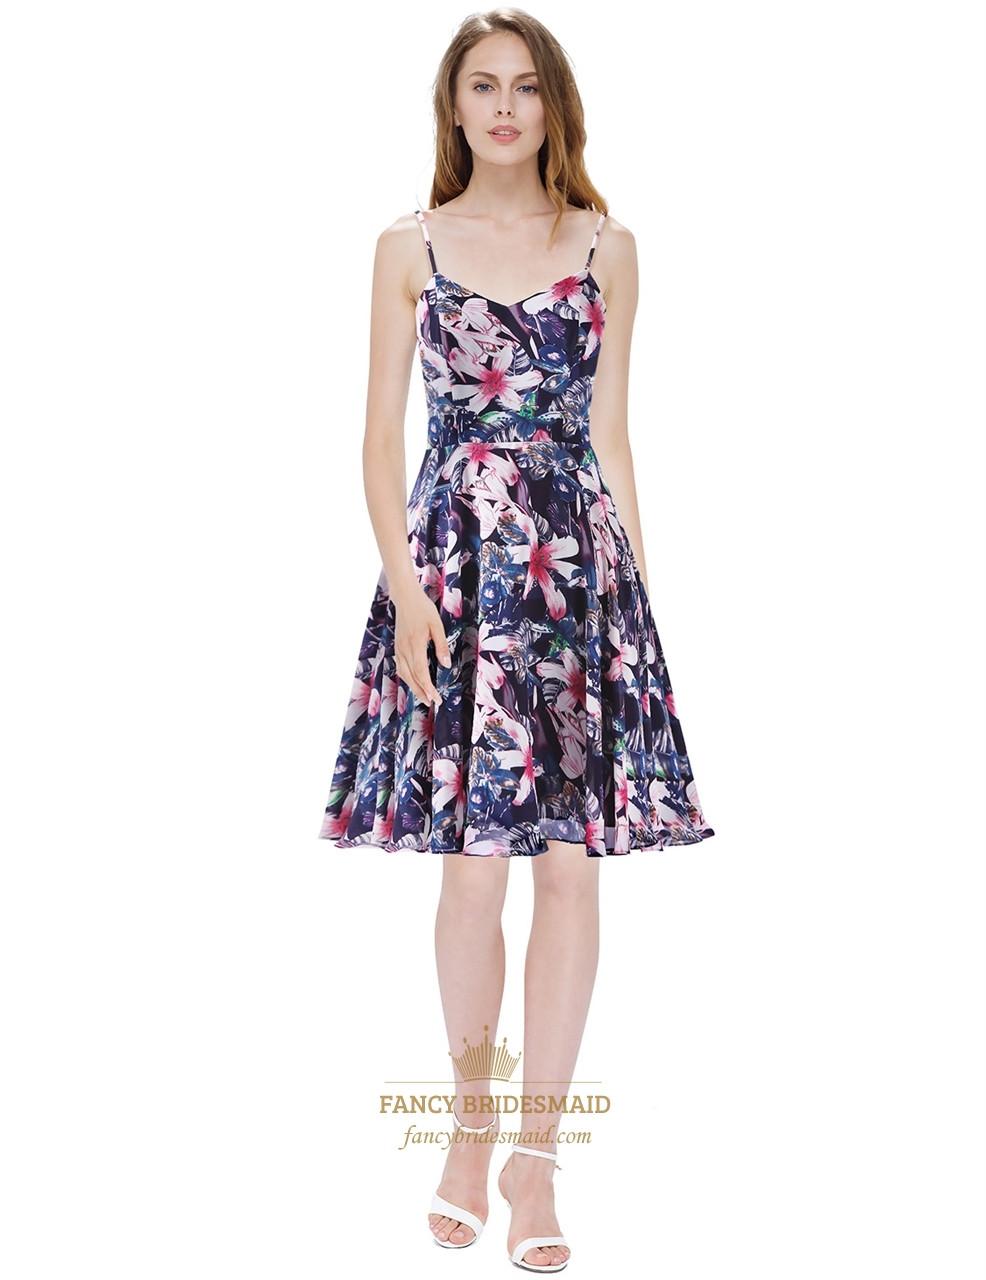 Spaghetti Strap Summer Dresses  Women s Floral Print Spaghetti Strap Knee Length Chiffon